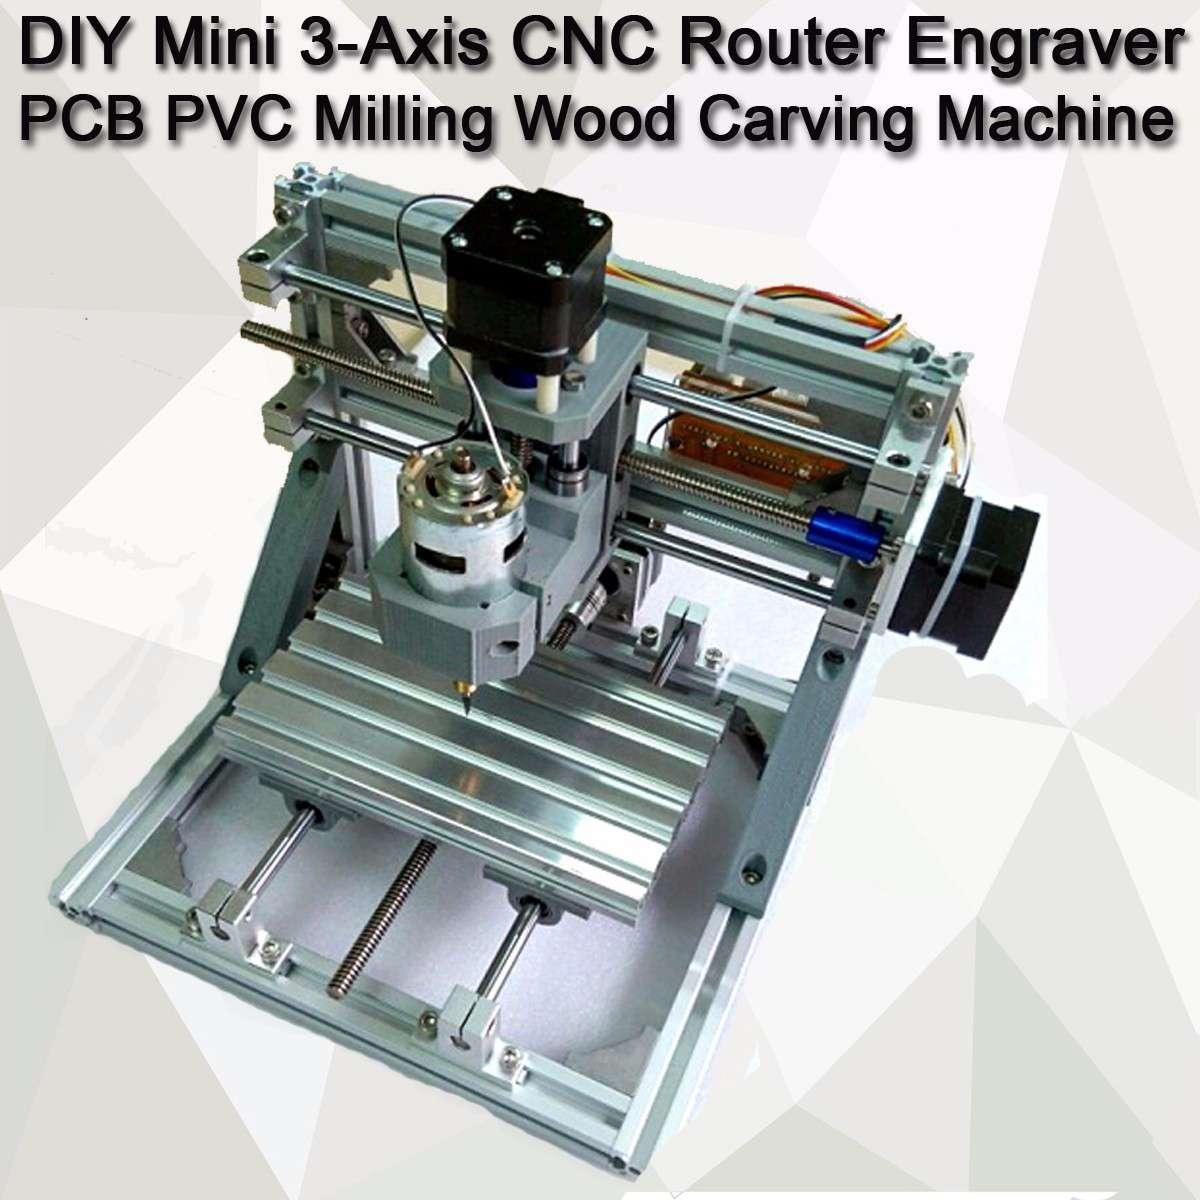 DIY Мини 3 оси ЧПУ маршрутизатор гравер PCB ПВХ фрезерный станок для резьбы по дереву DIY M